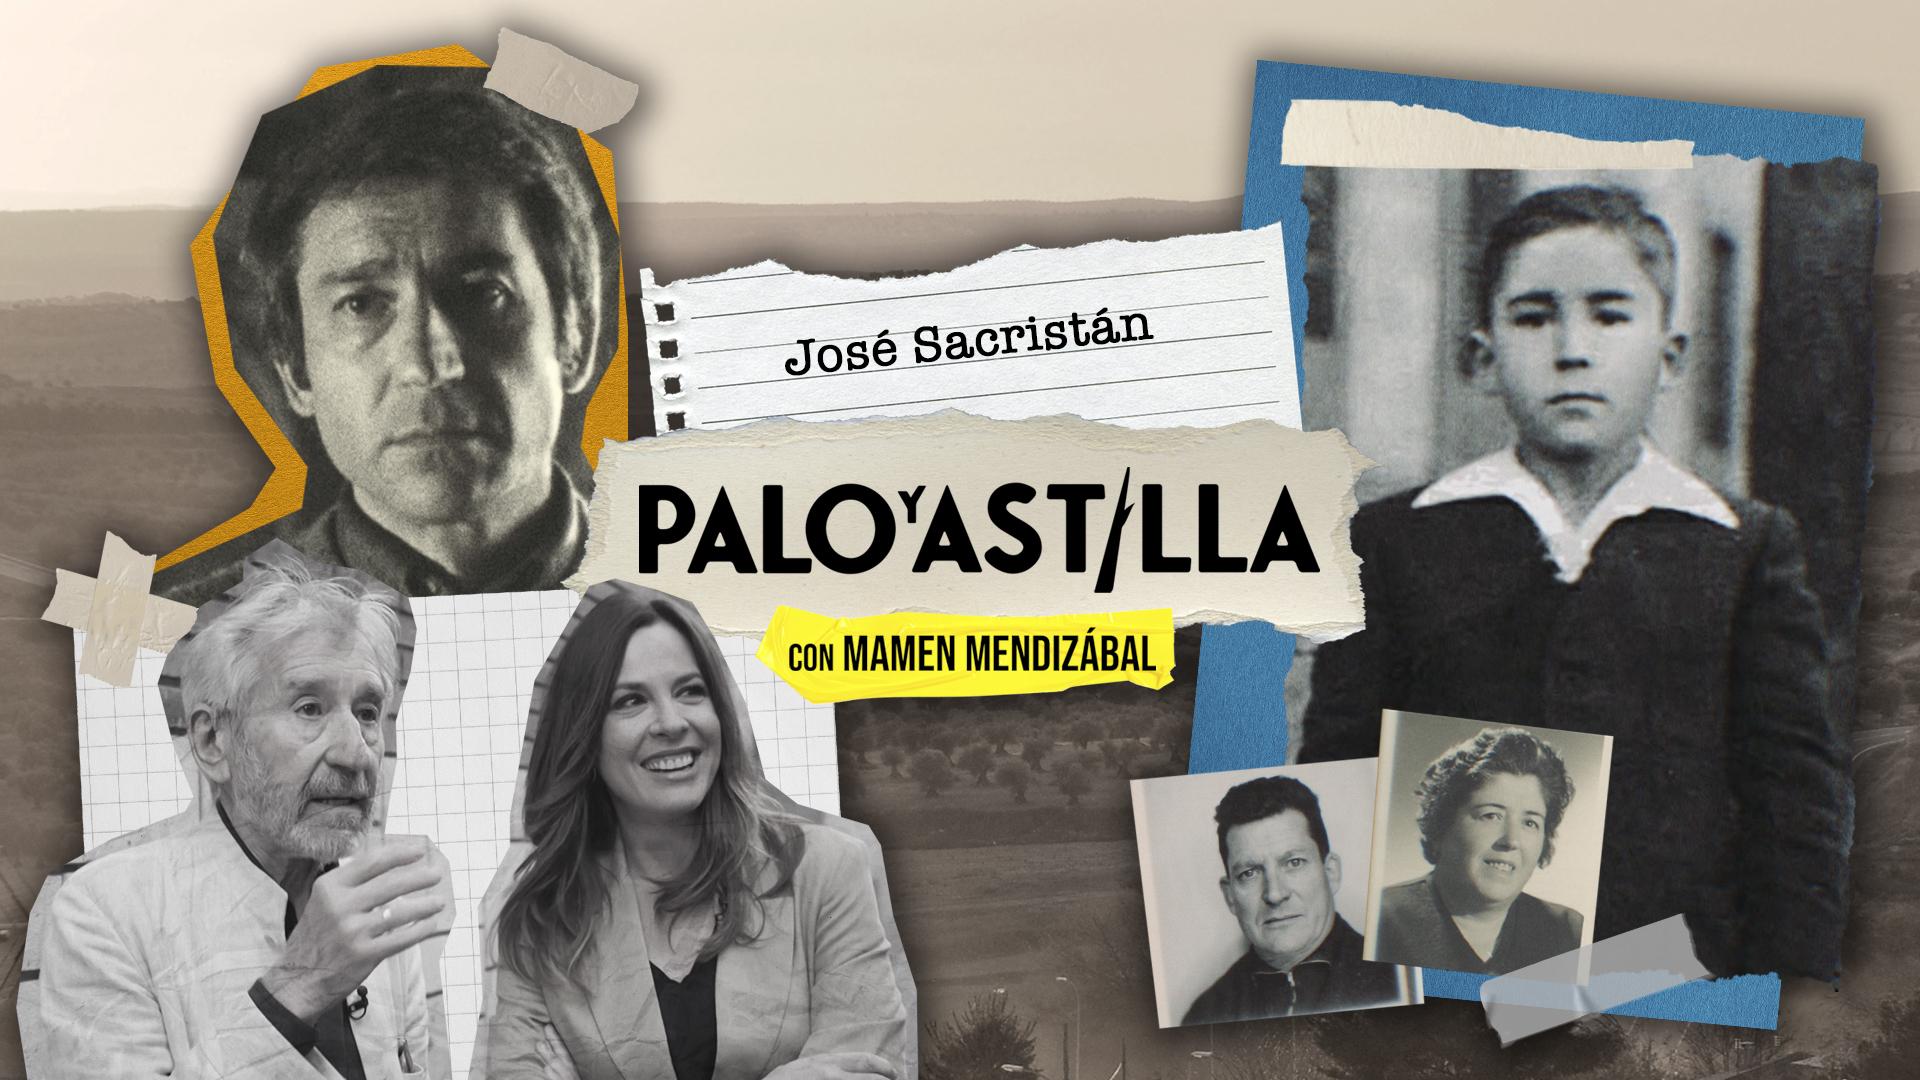 Temporada 1 José Sacristán